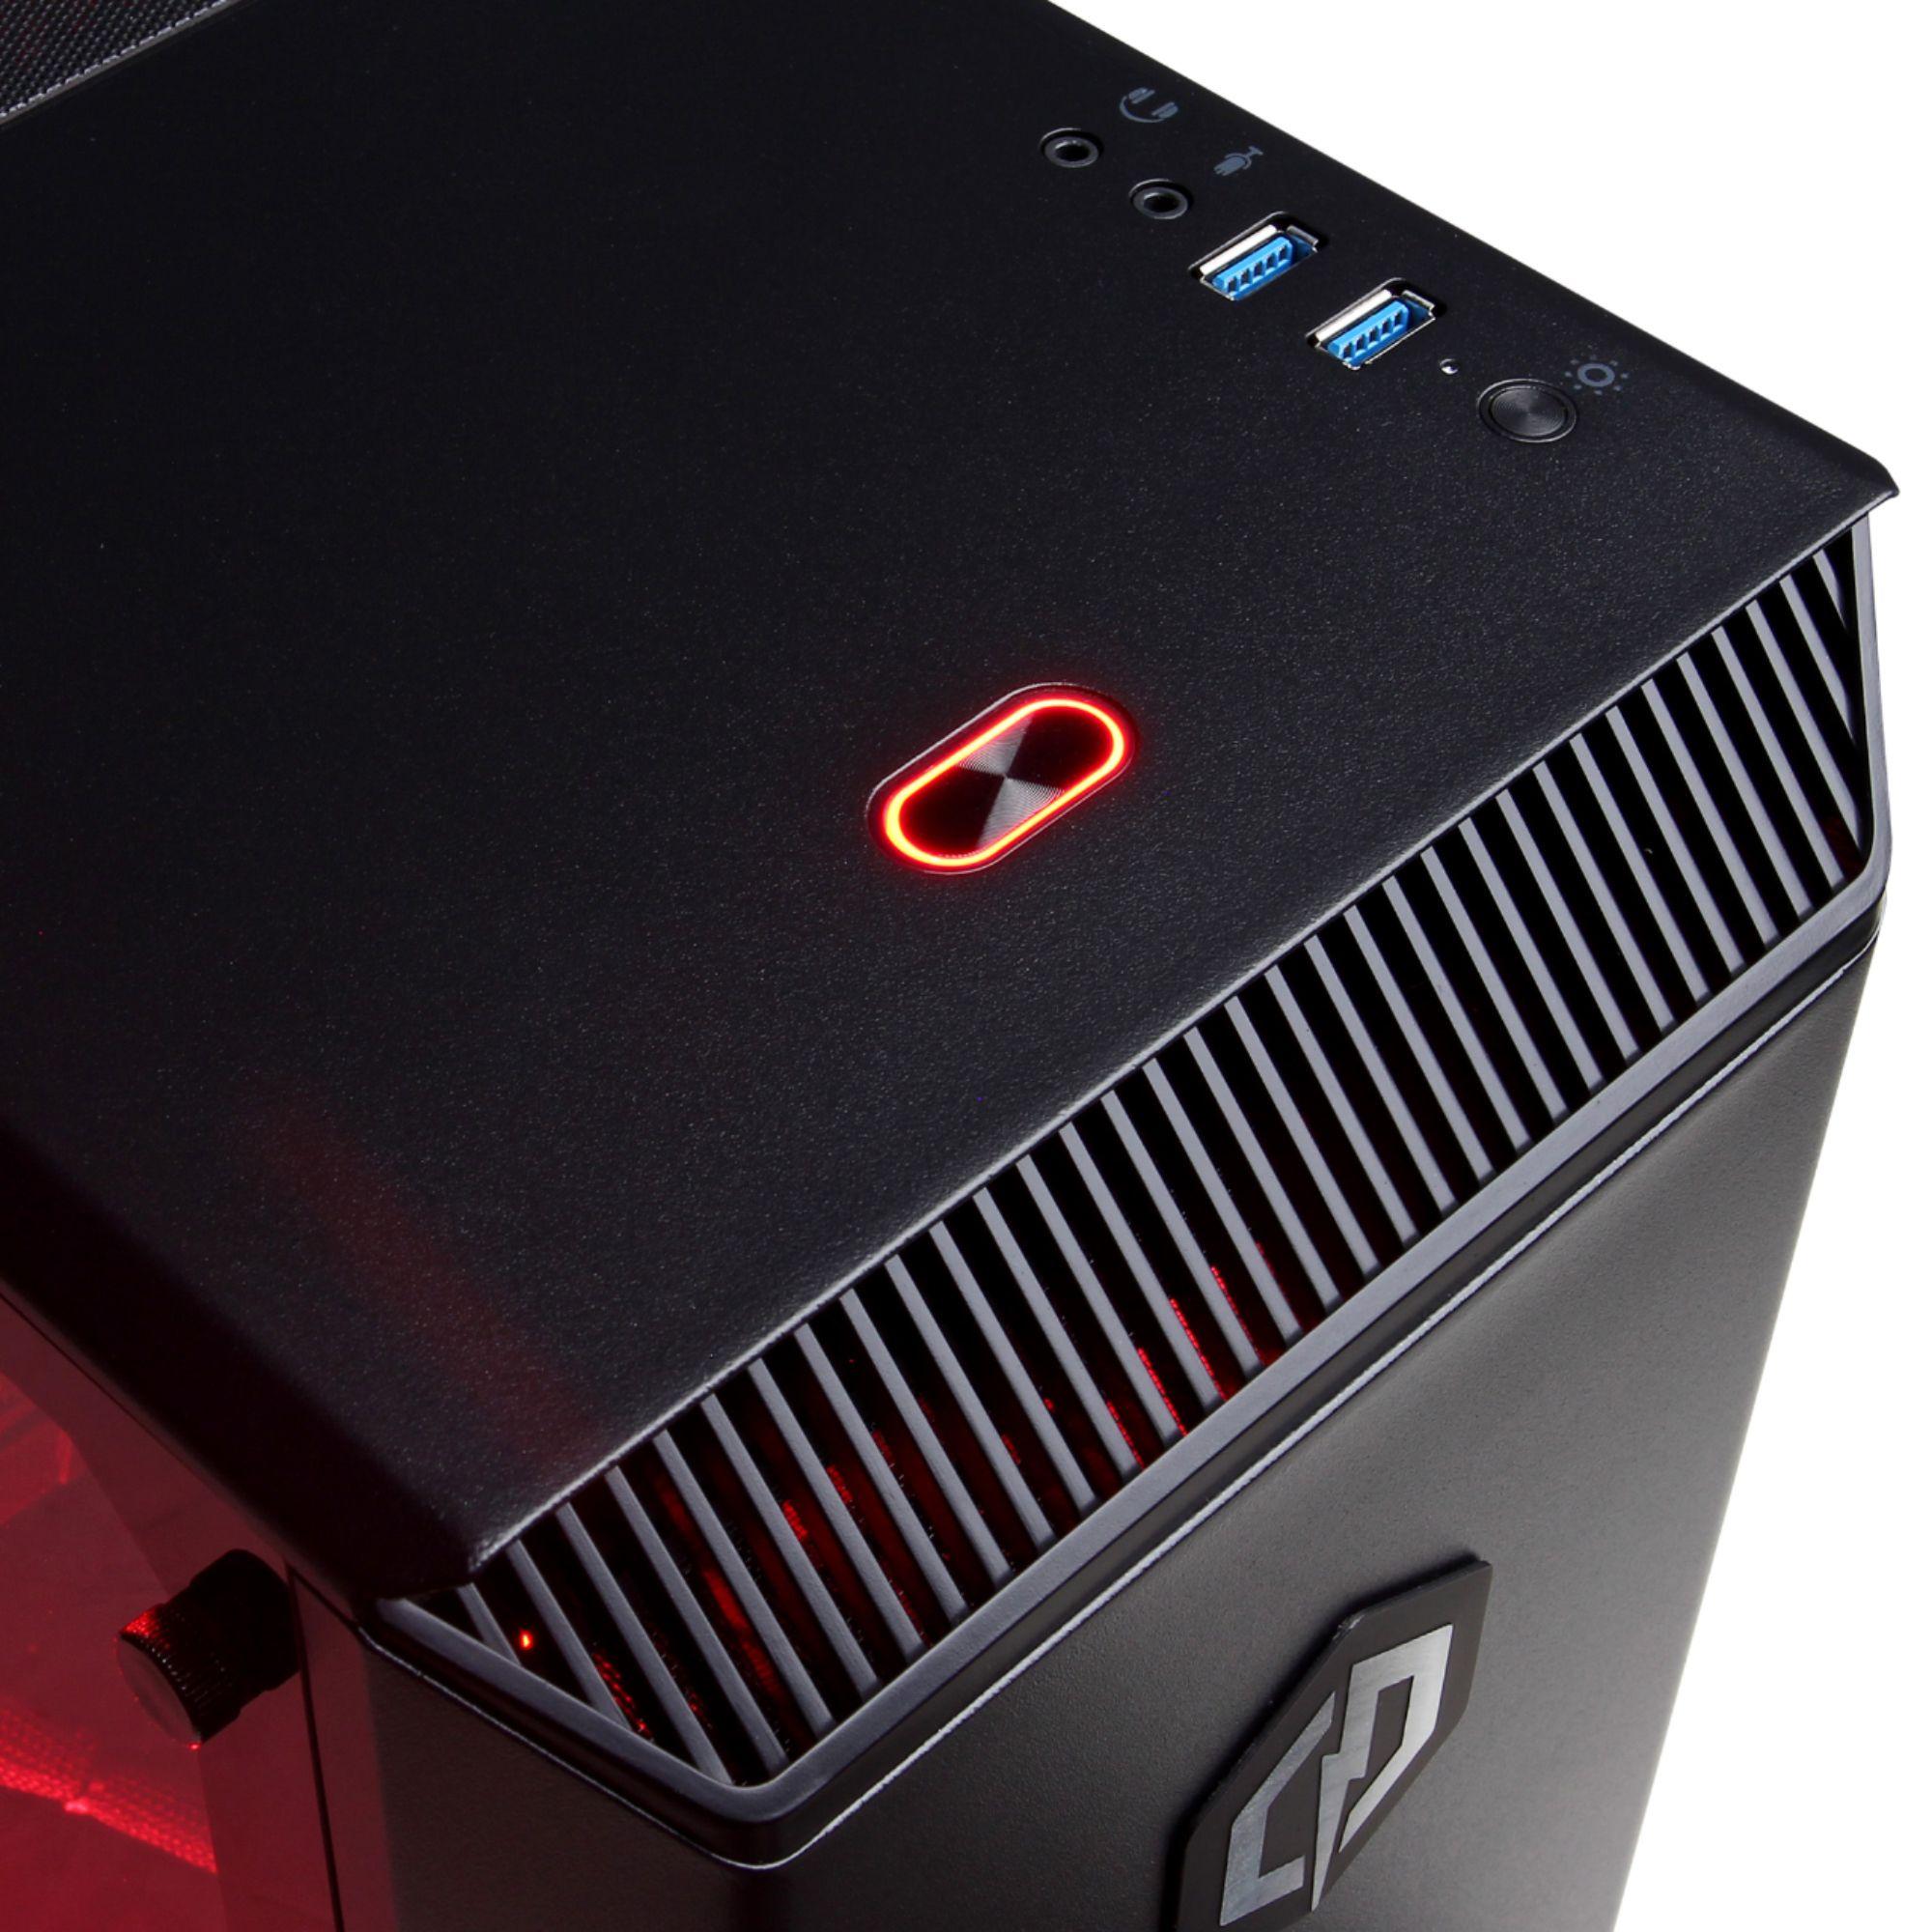 CyberPowerPC GXIVR2900BST Gamer Xtreme Desktop Intel Core i7-8700K 16GB  Memory NVIDIA GeForce GTX 1080 Ti 2TB HDD + 240GB SSD Black